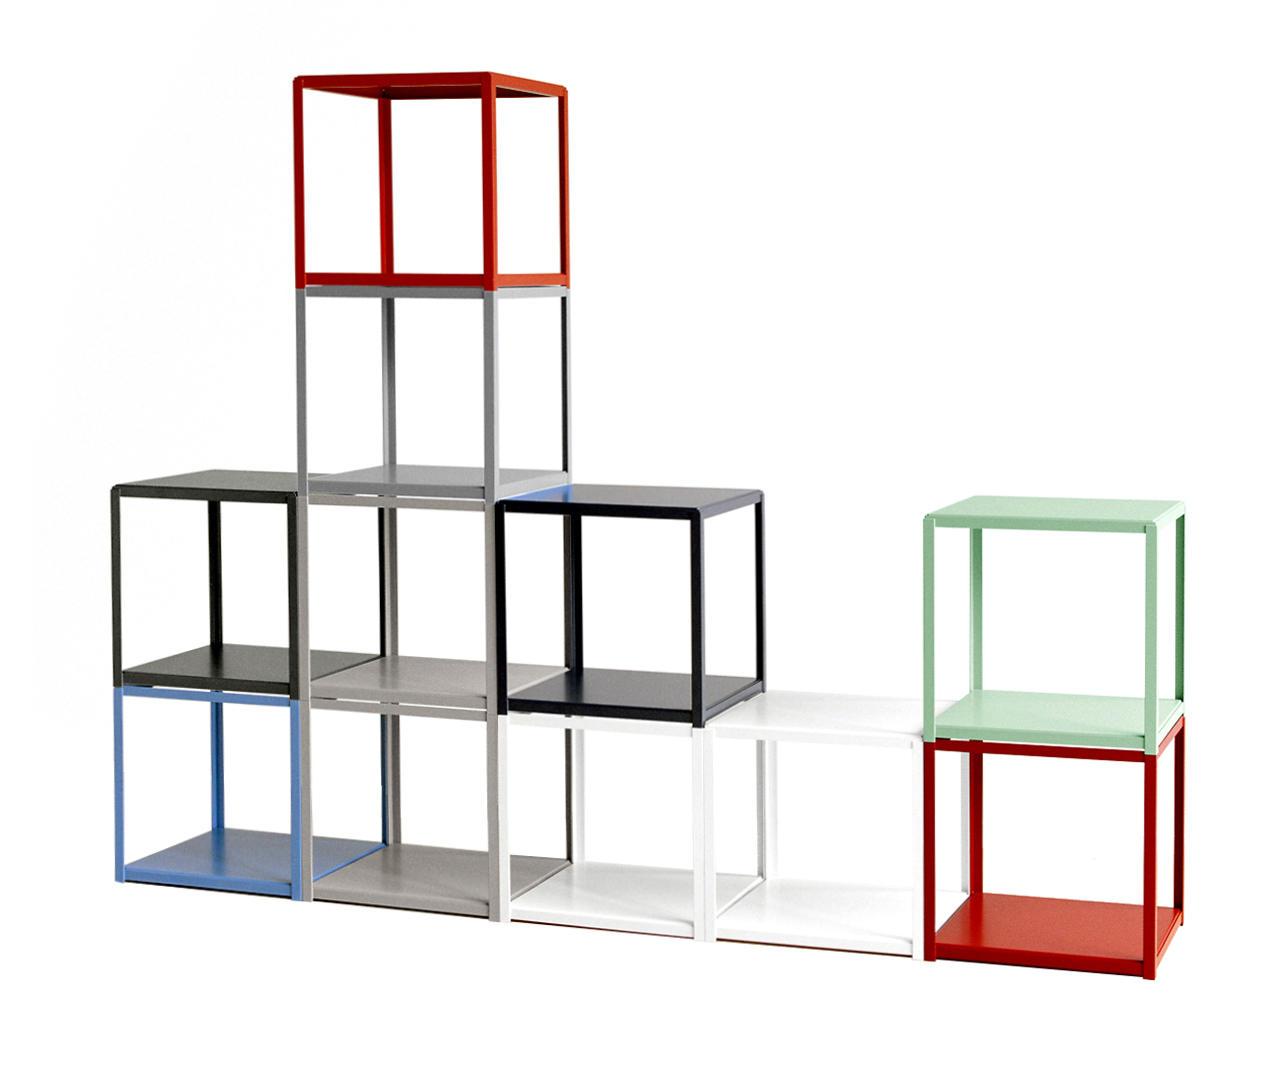 fortyforty regalmodule von e15 architonic. Black Bedroom Furniture Sets. Home Design Ideas